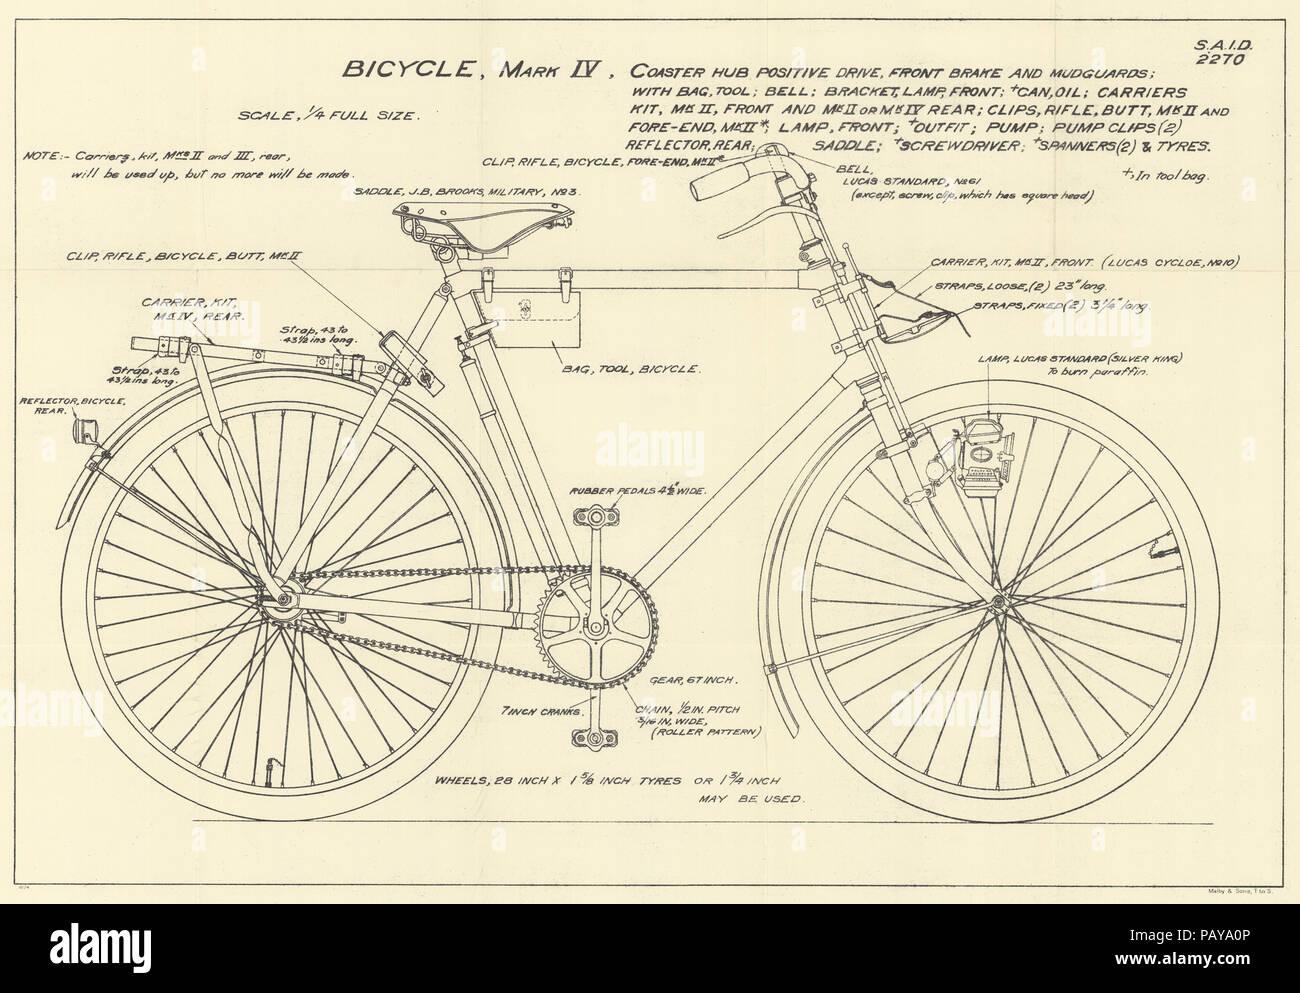 Wwii Bicycle Immagini Wwii Bicycle Fotos Stock Alamy